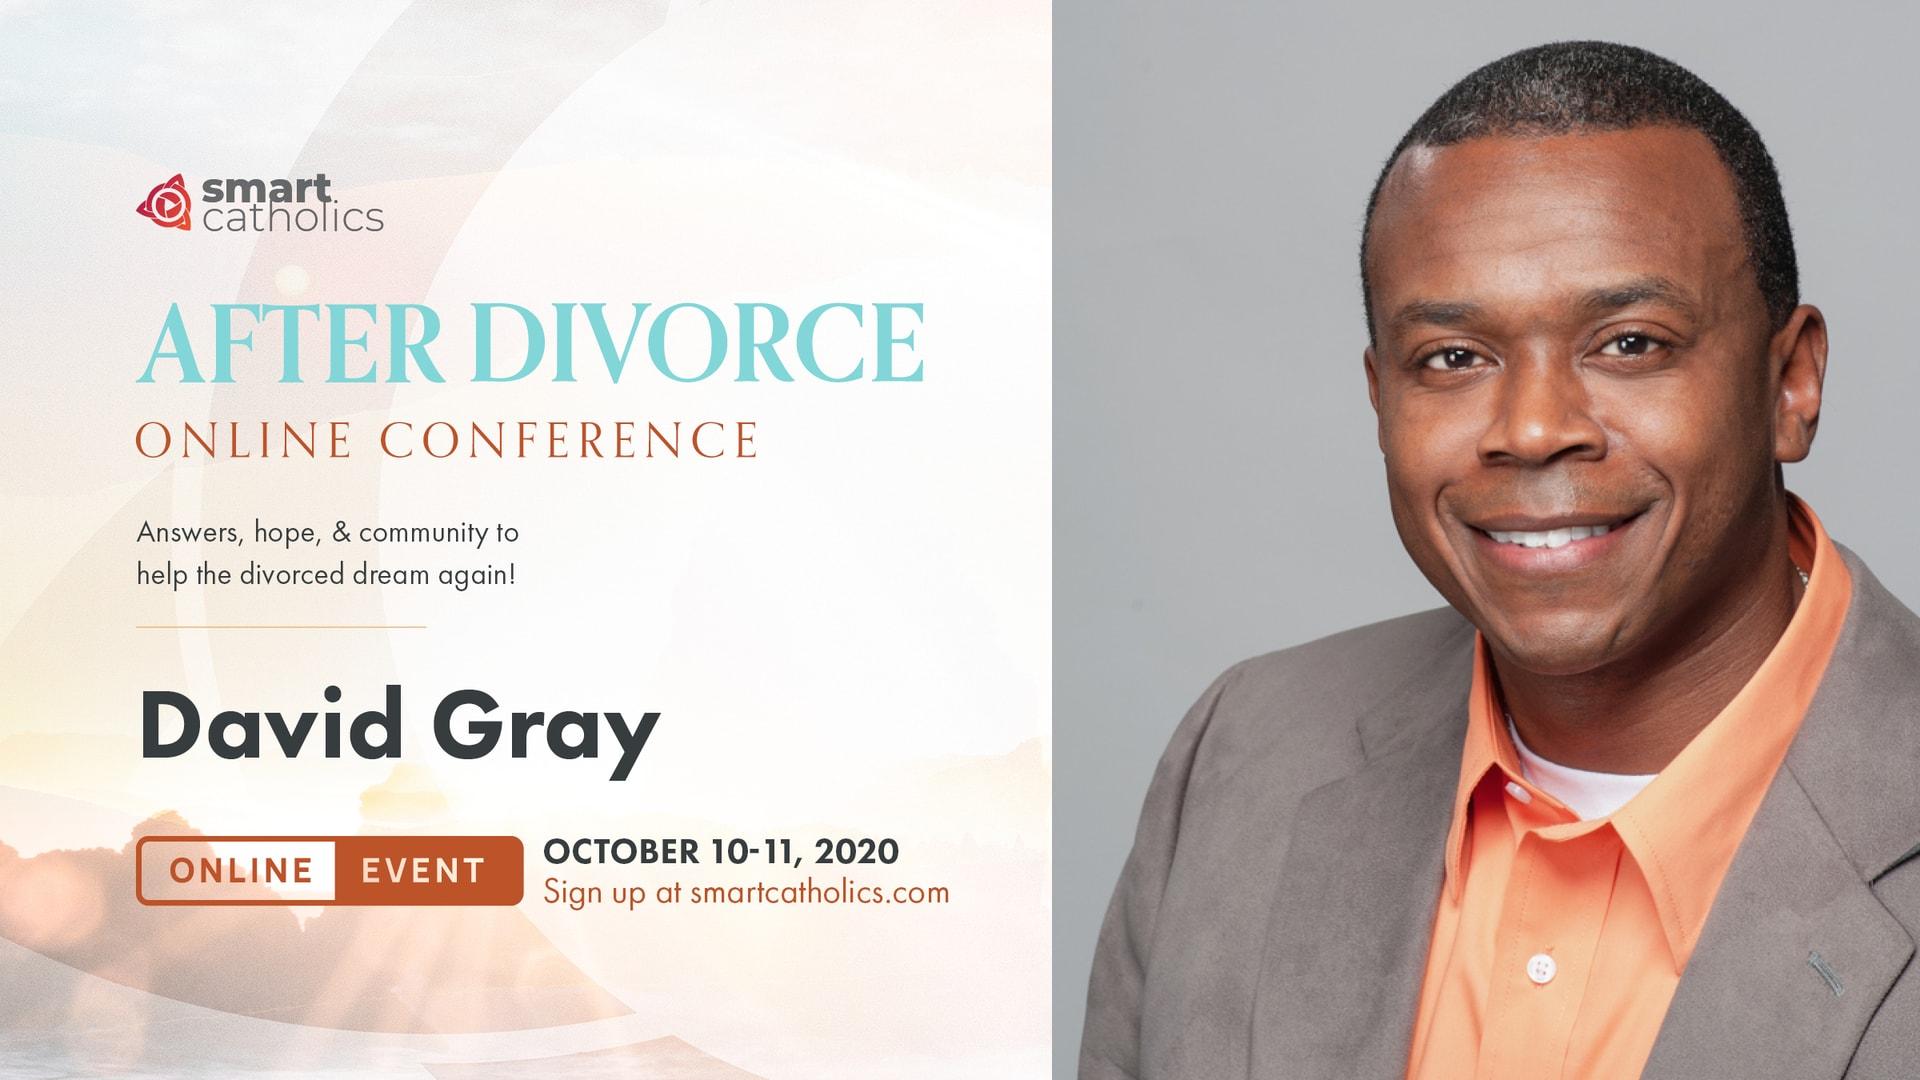 David Gray - 'After Divorce' 2020 Conference